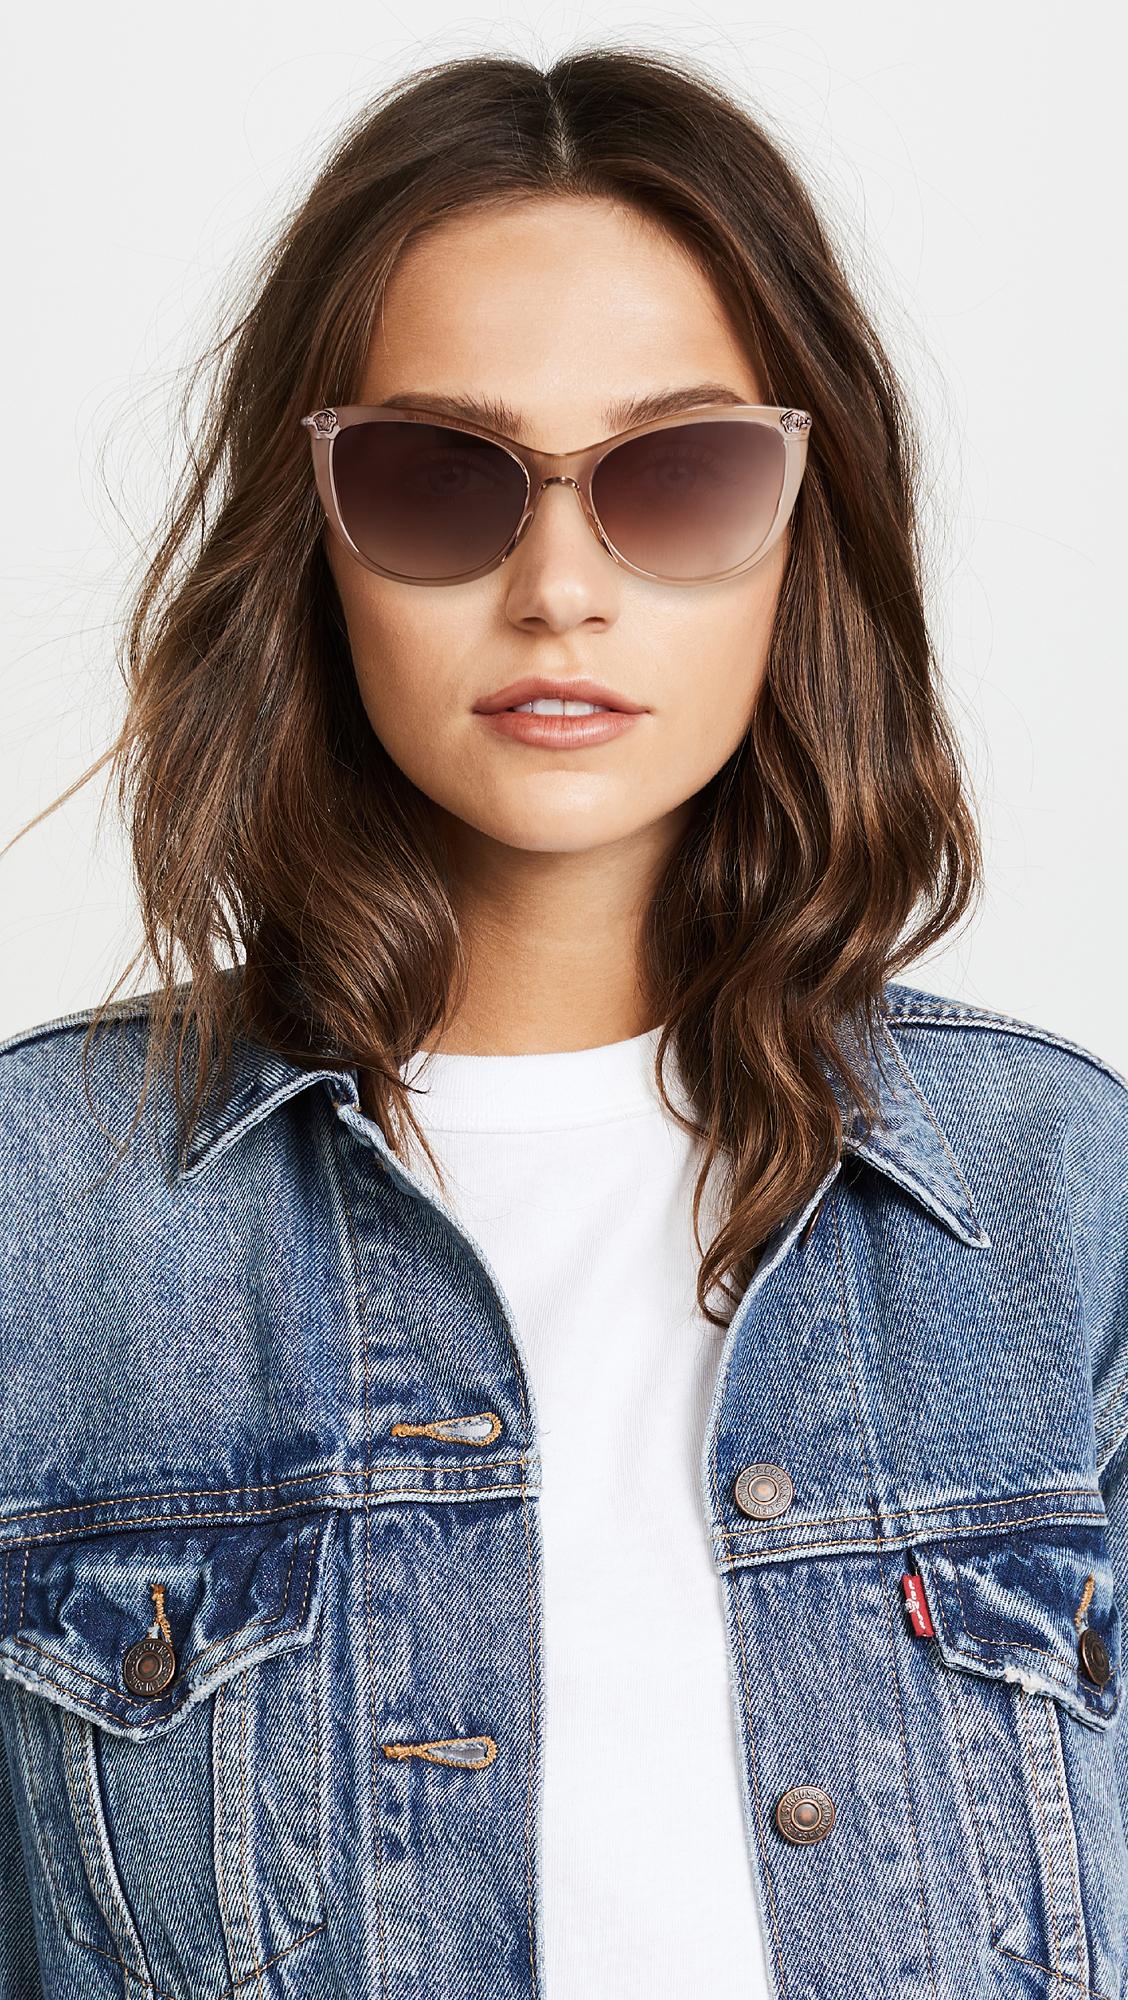 db33e06a9fdb Versace Pop Chic Sunglasses